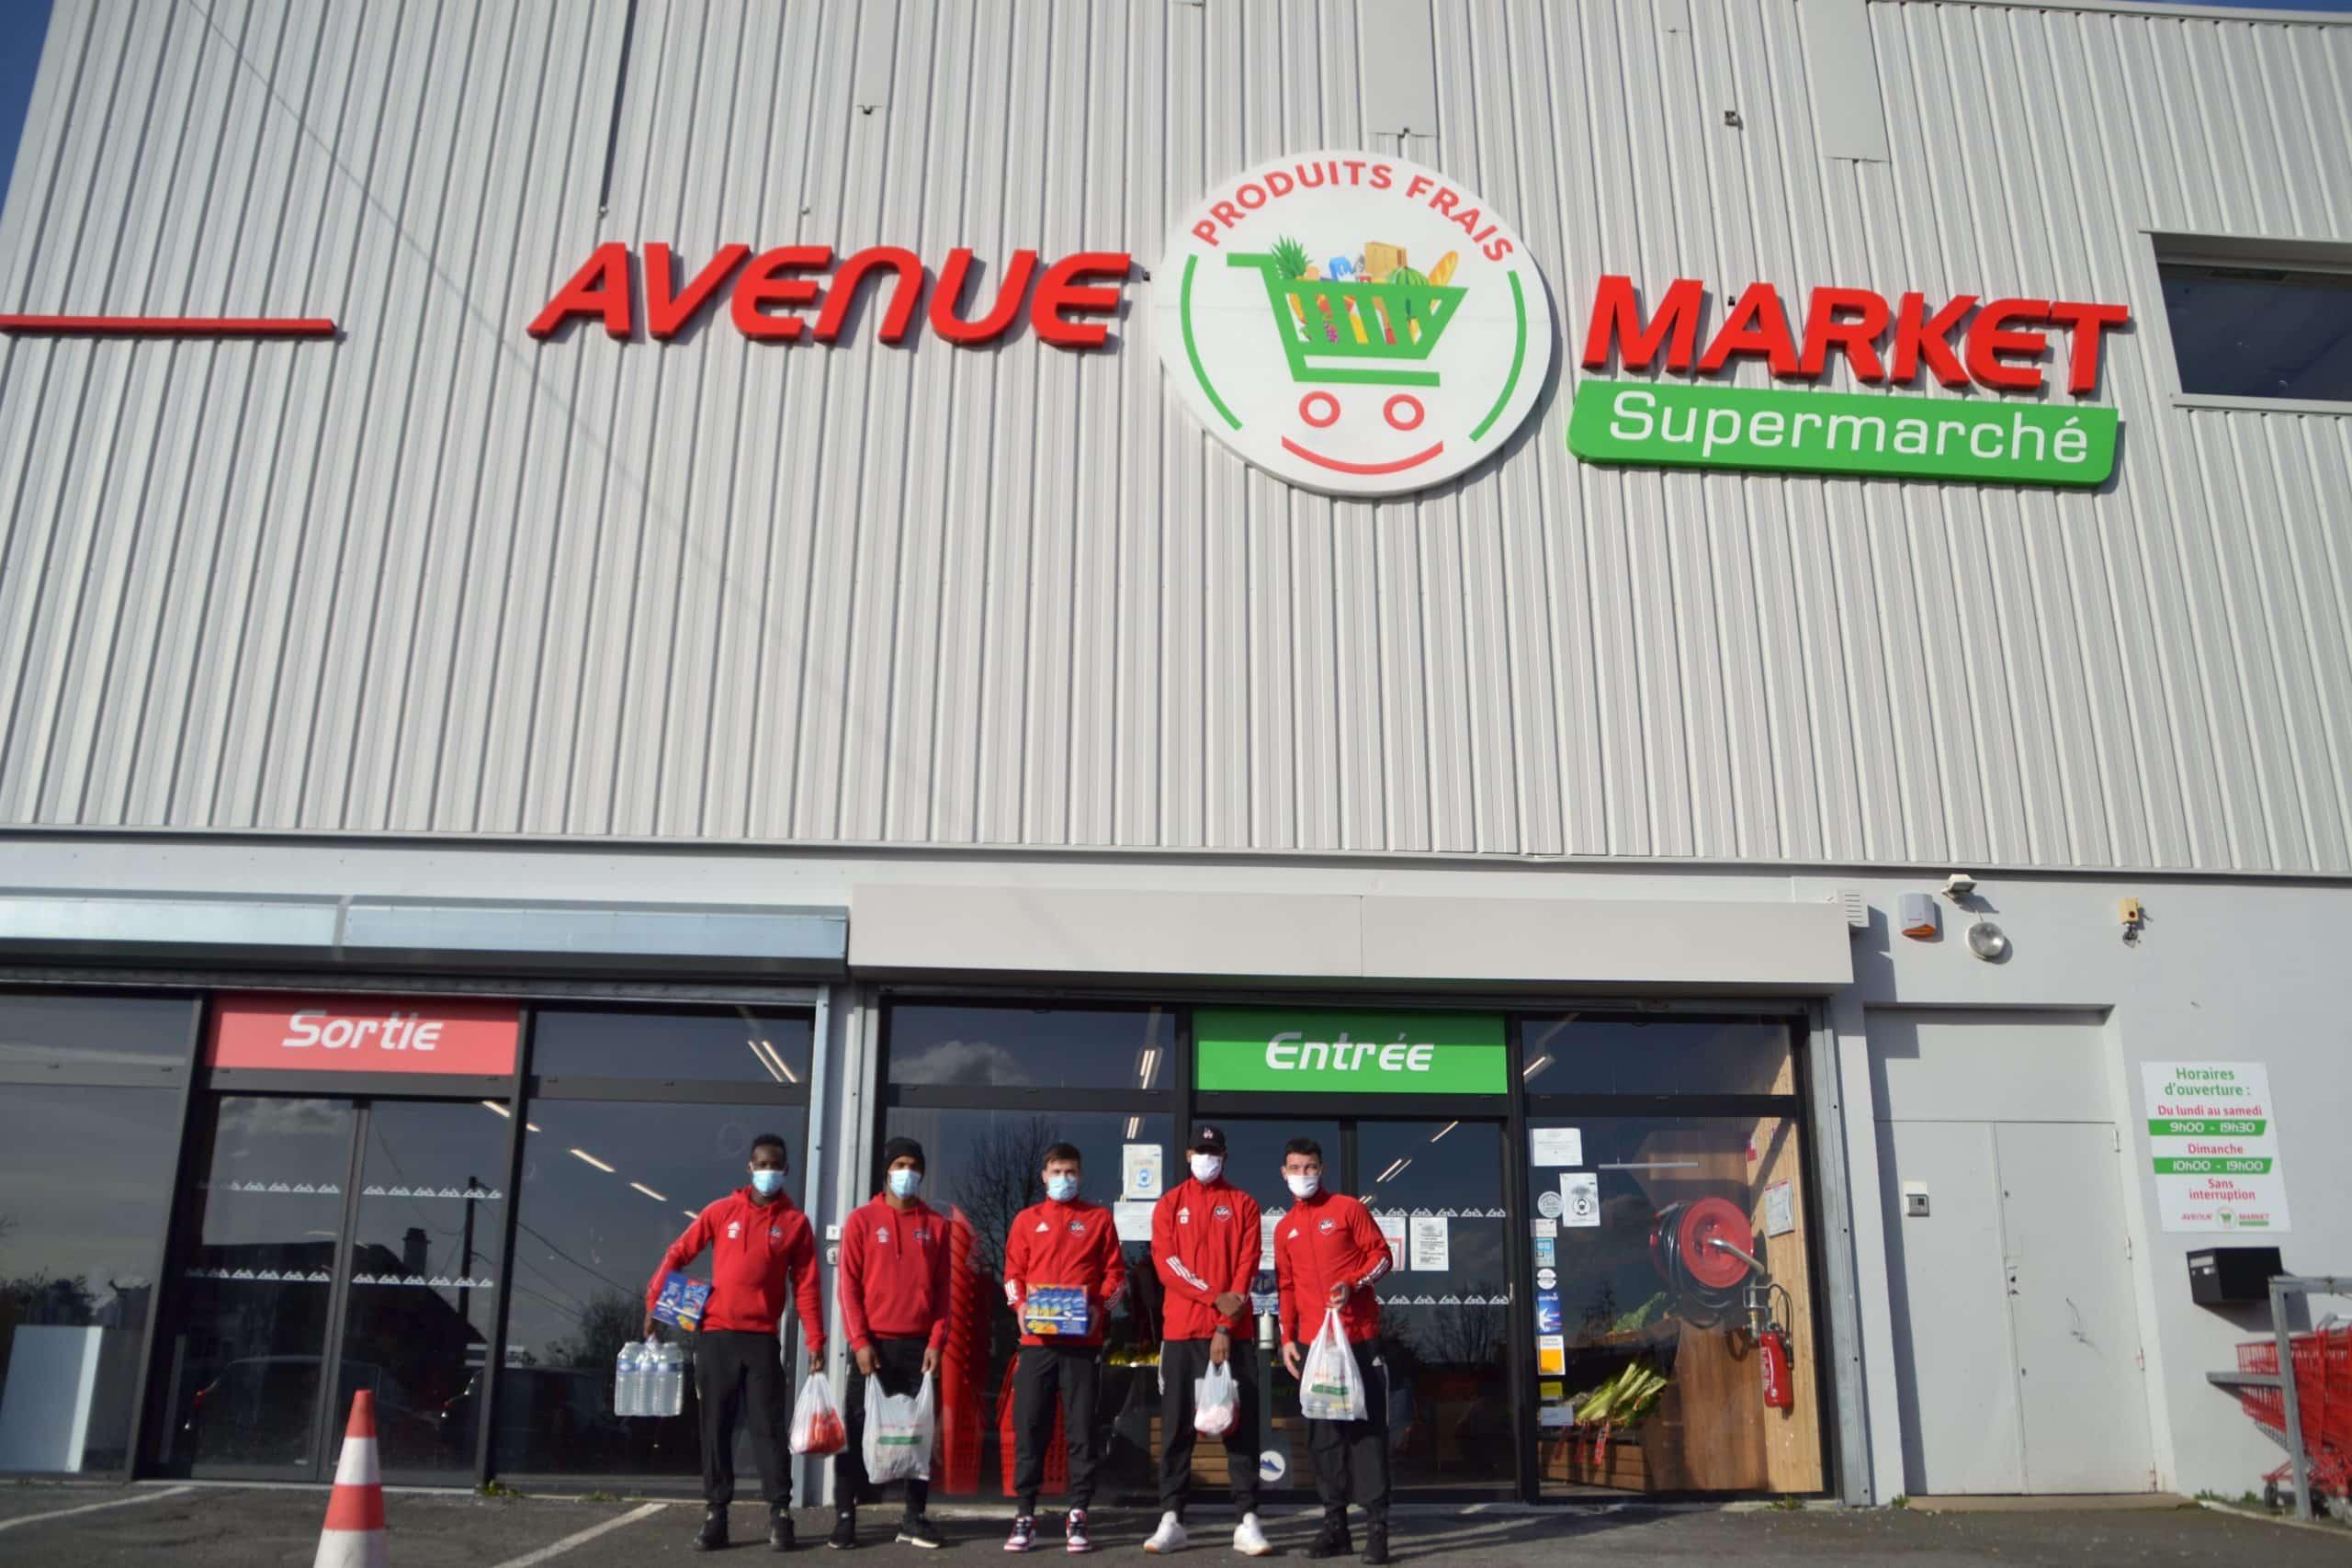 Avenue Market